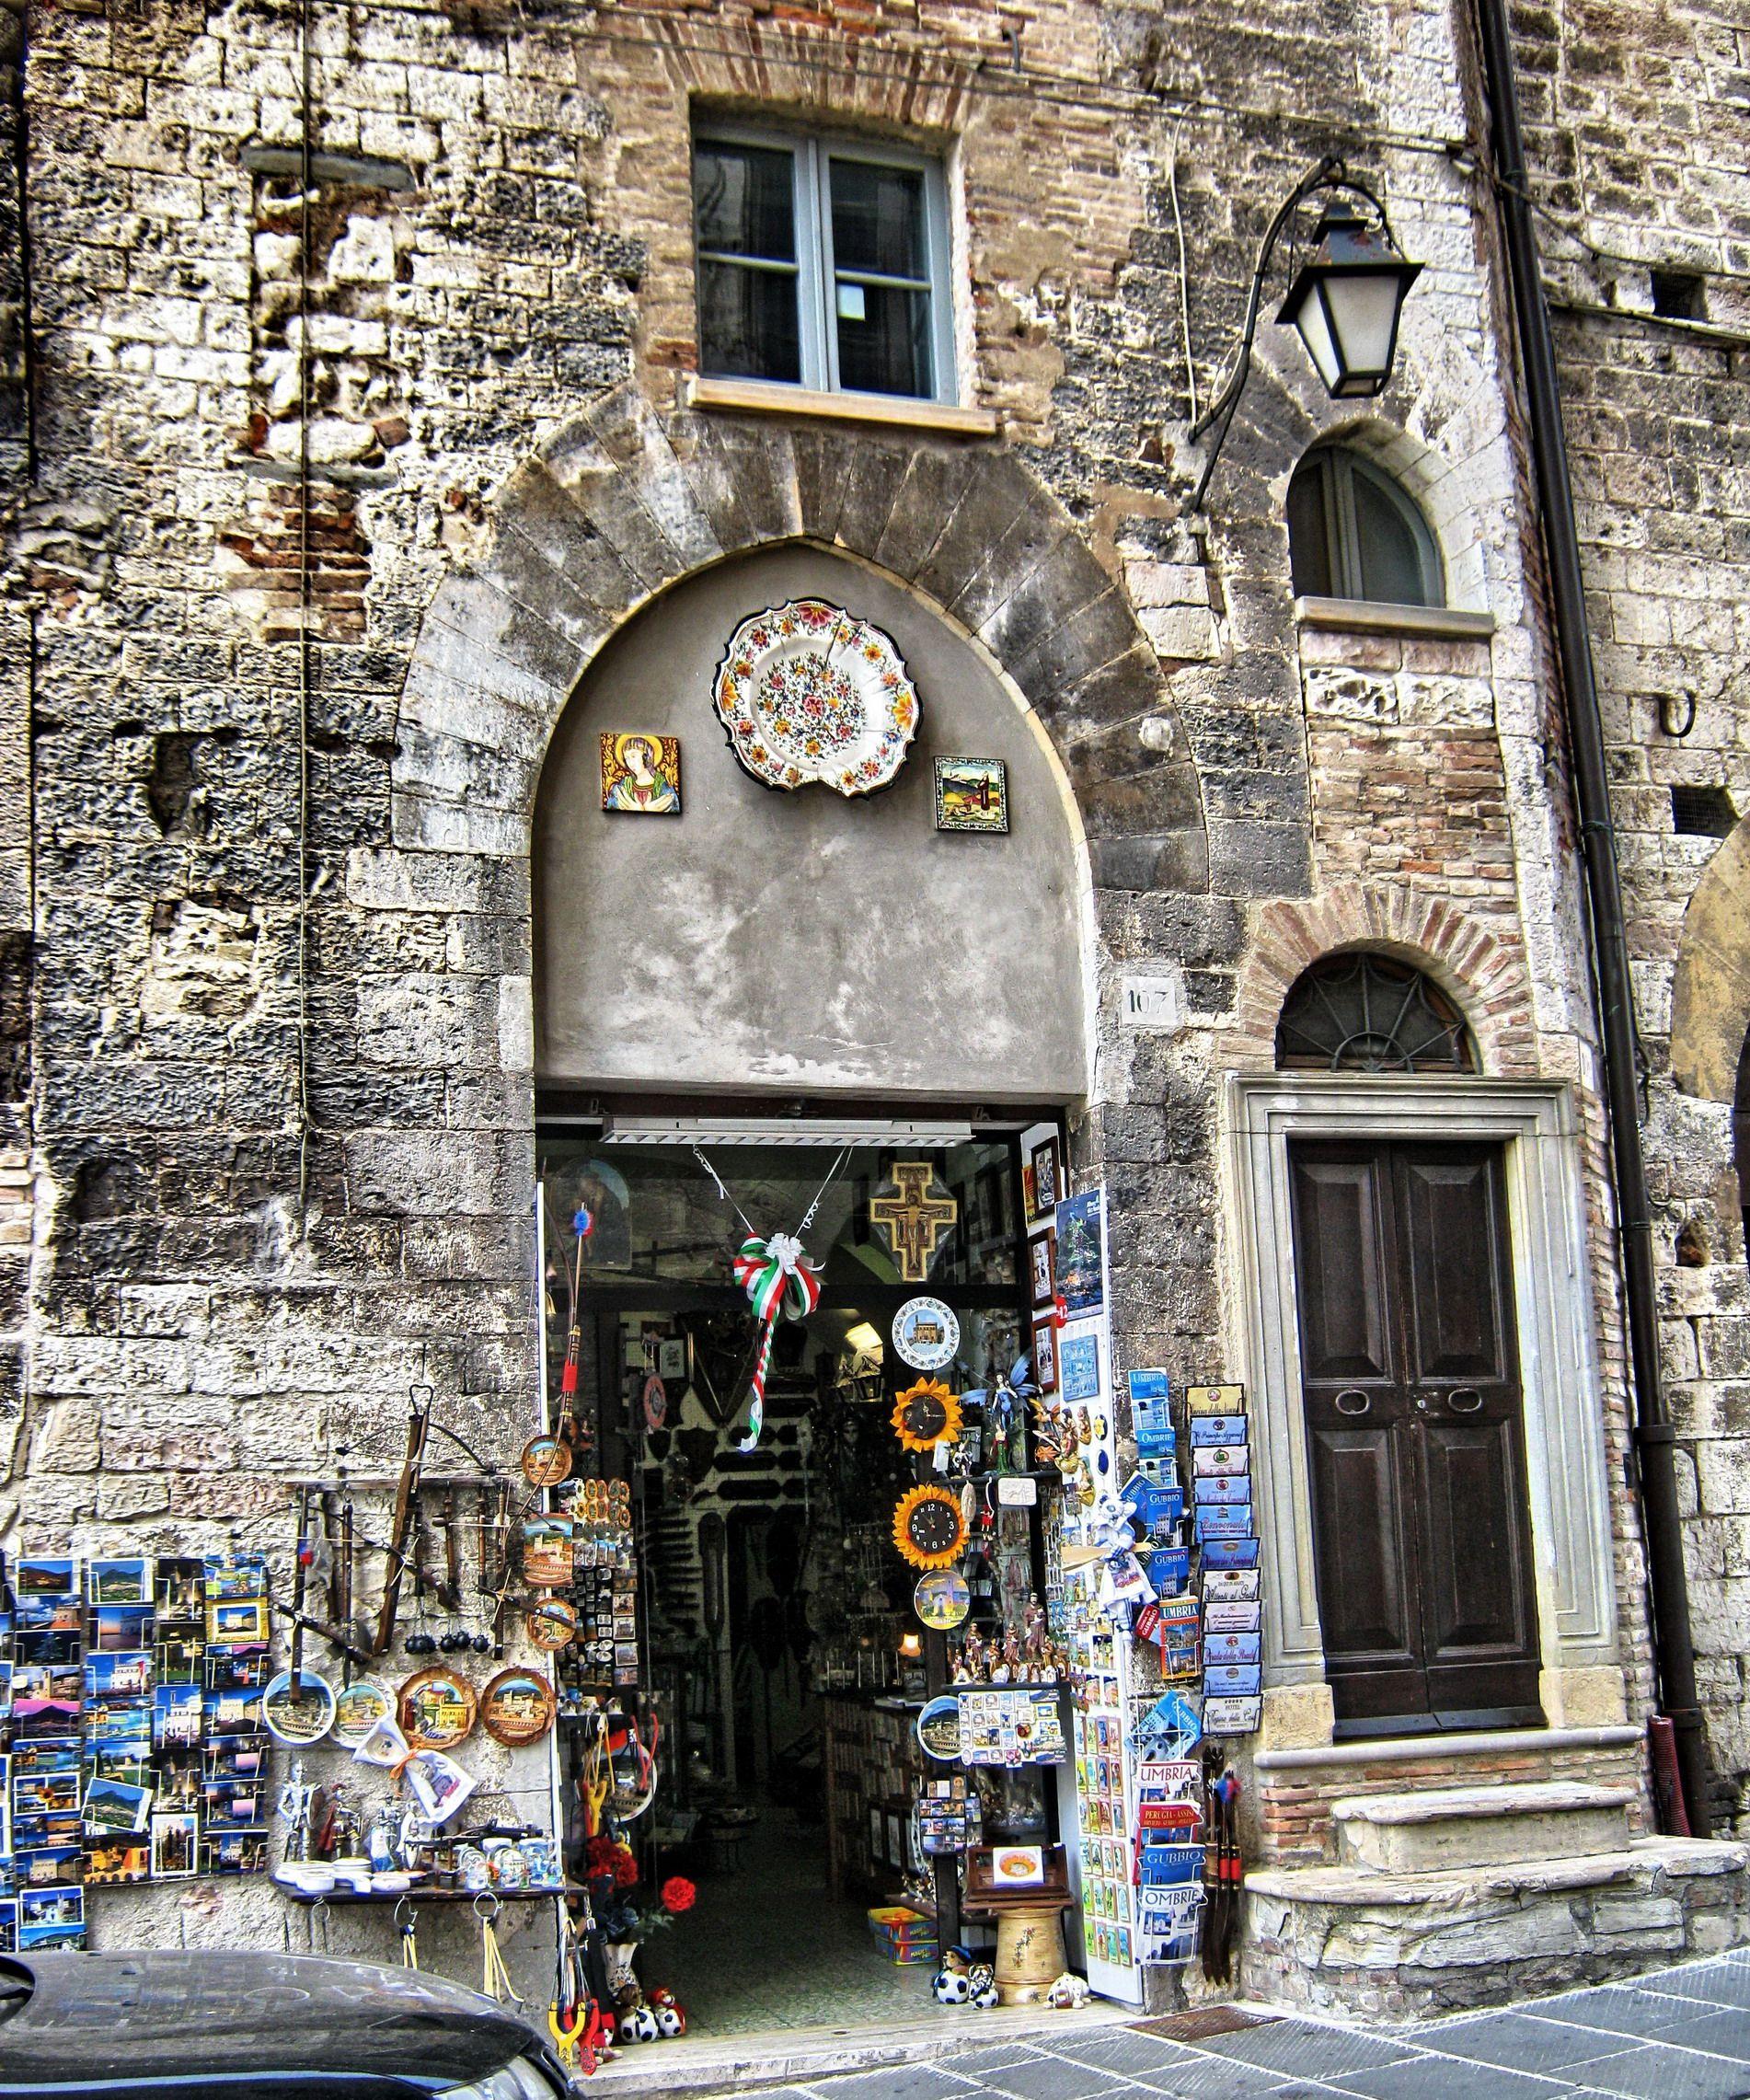 GUBBIO (Umbria) - Italy - by Guido Tosatto